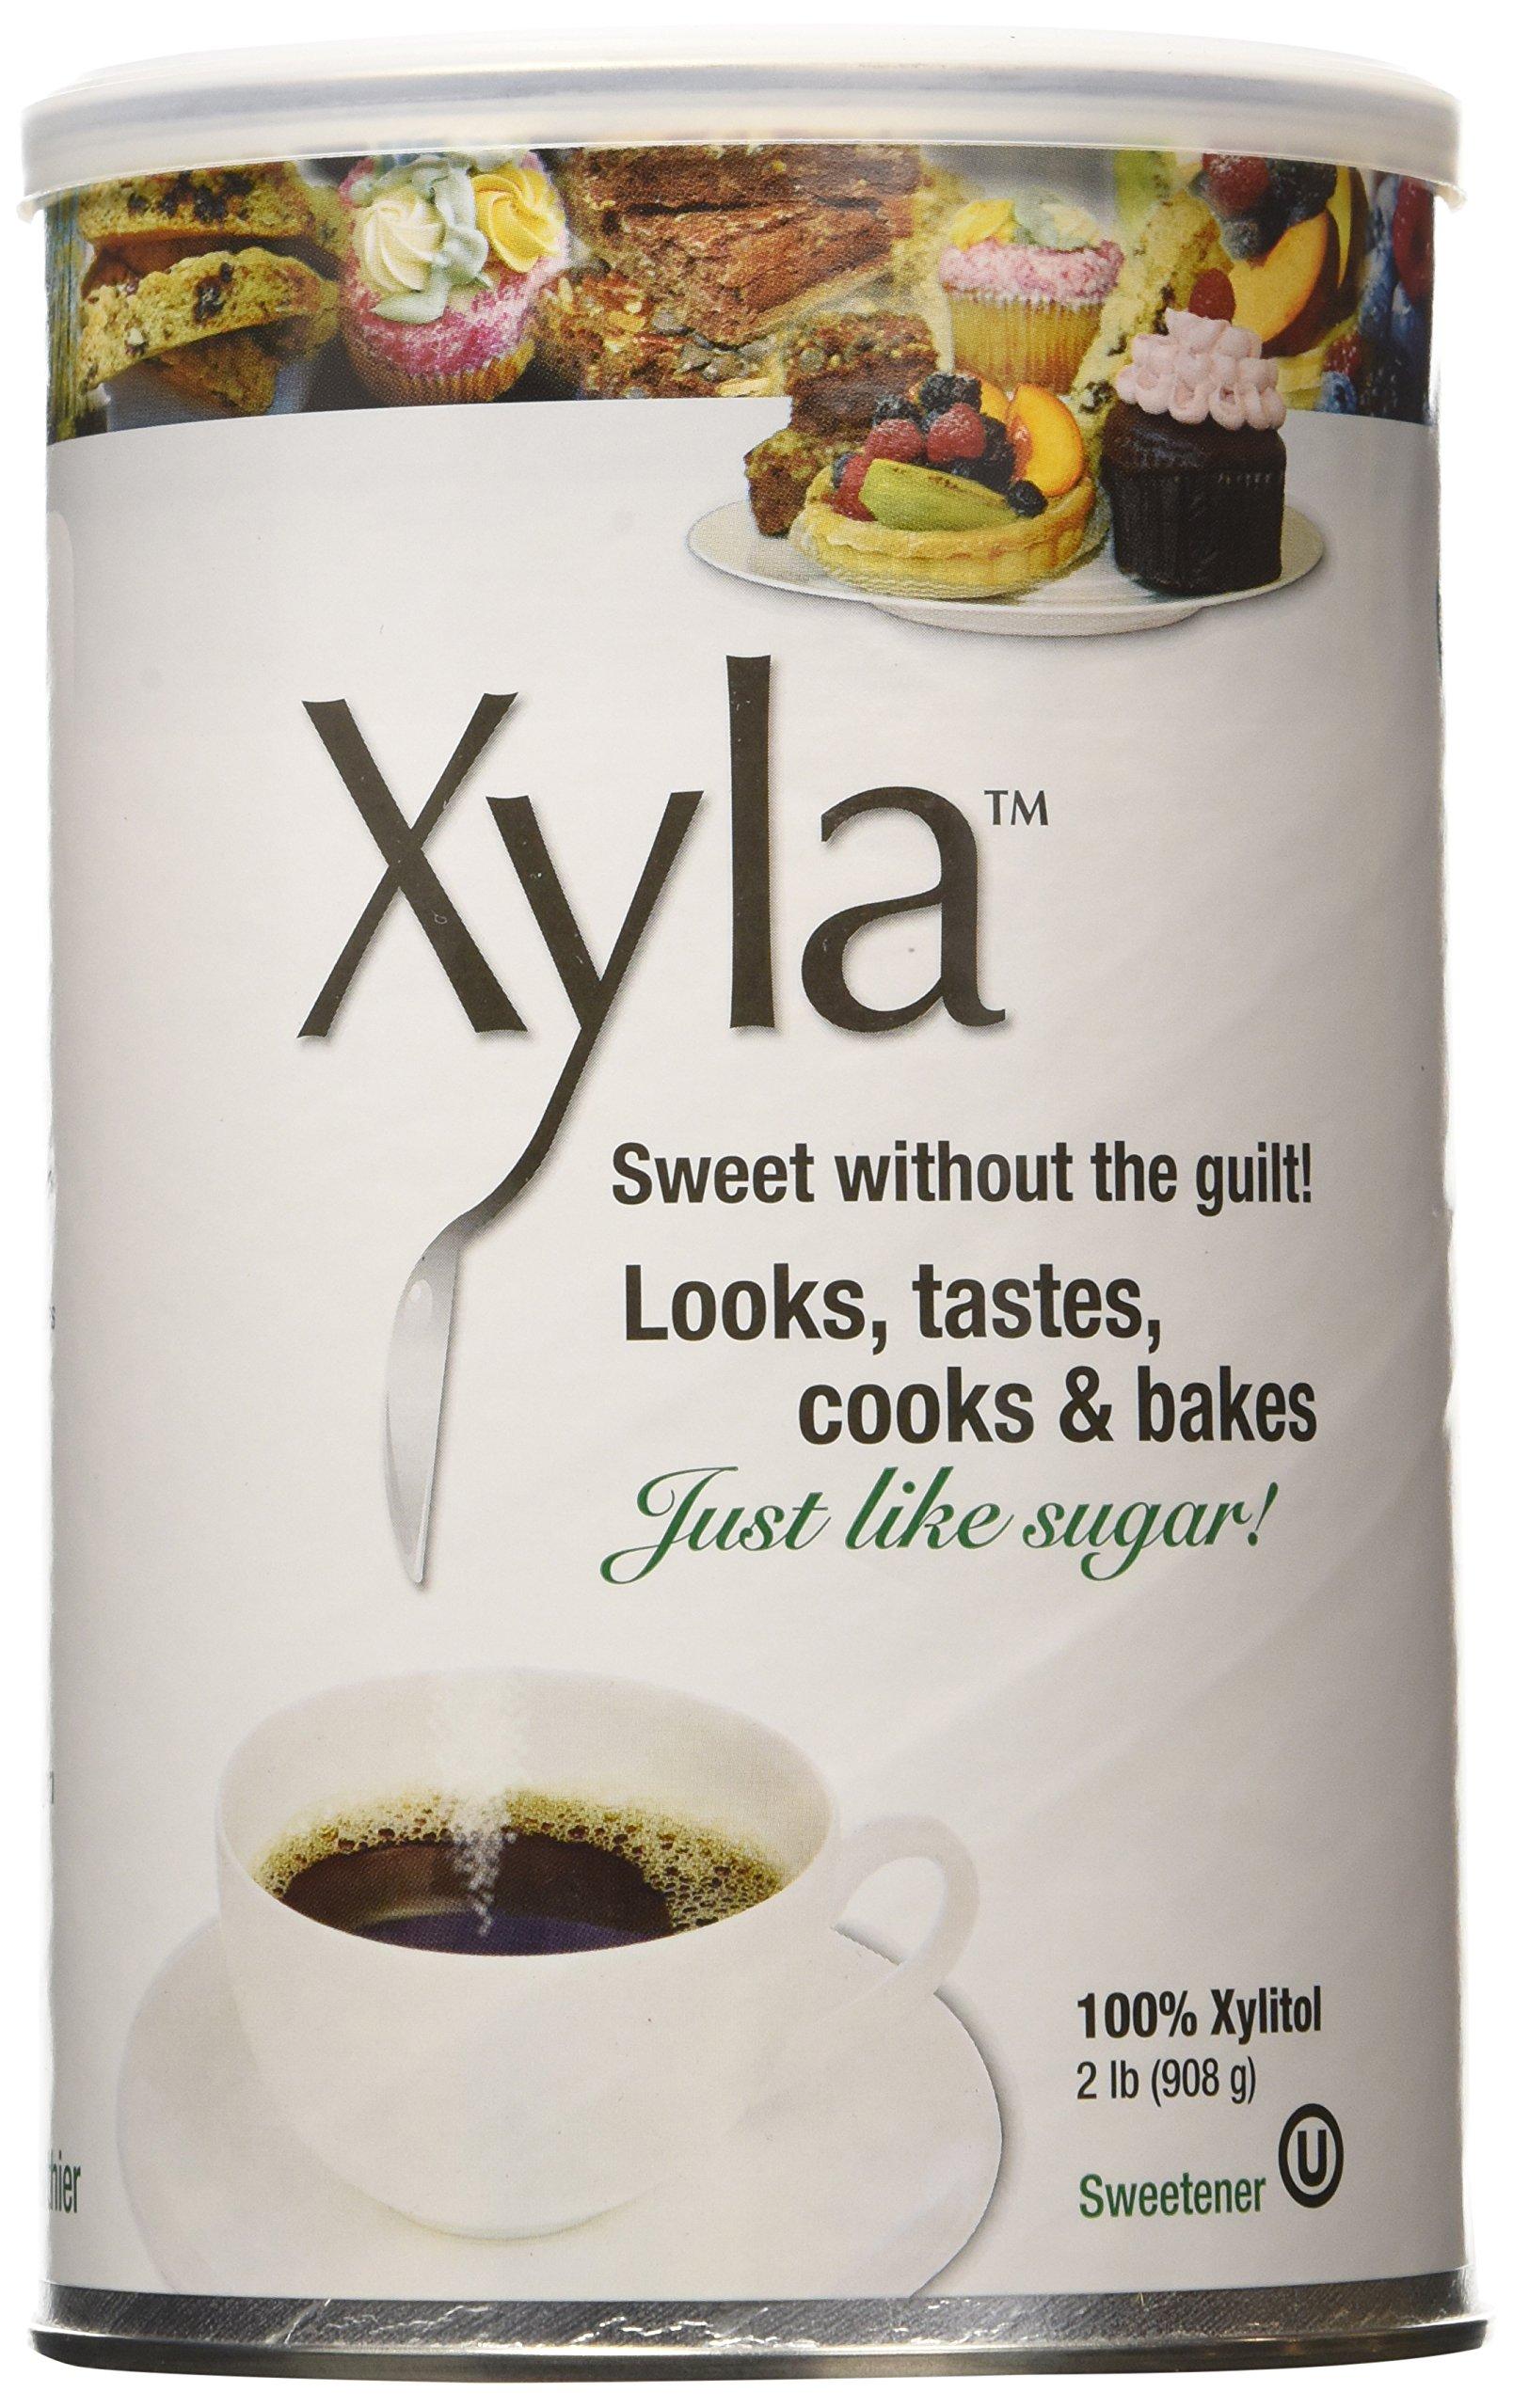 Xyla Xyla All Natural Sugar Free Sweetener 2 lbs.